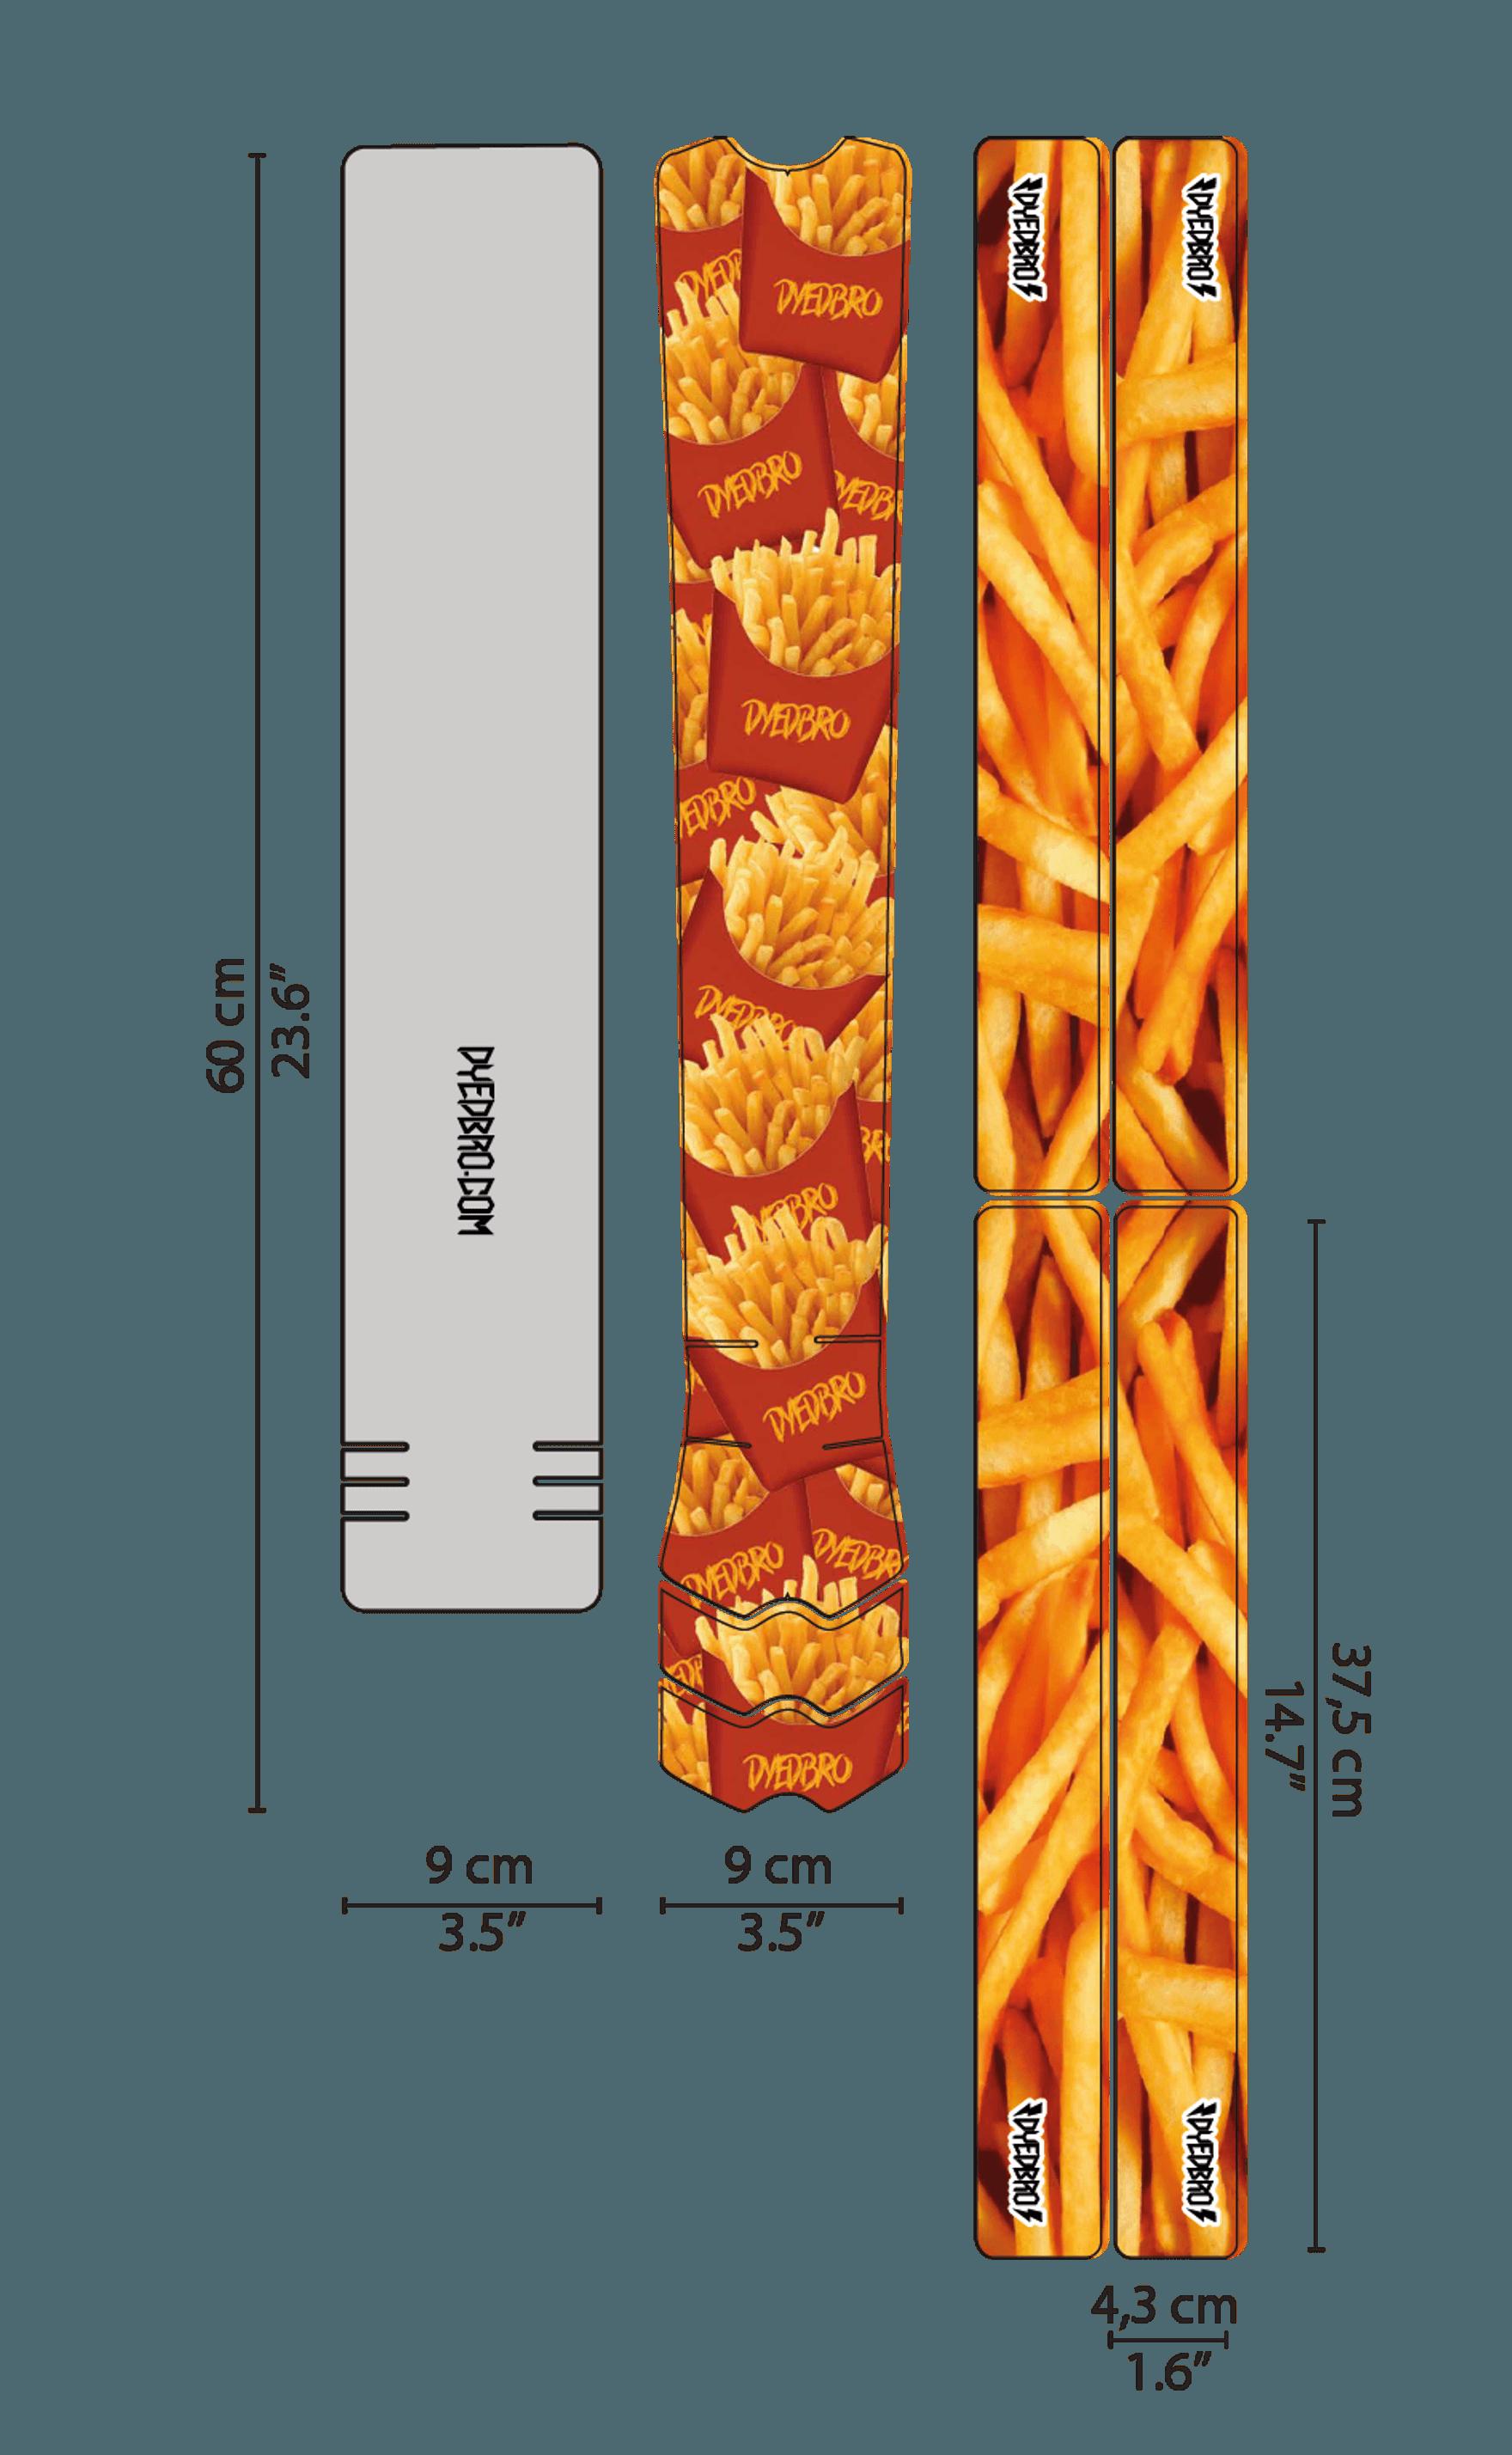 DYE Dbro French Fries 5